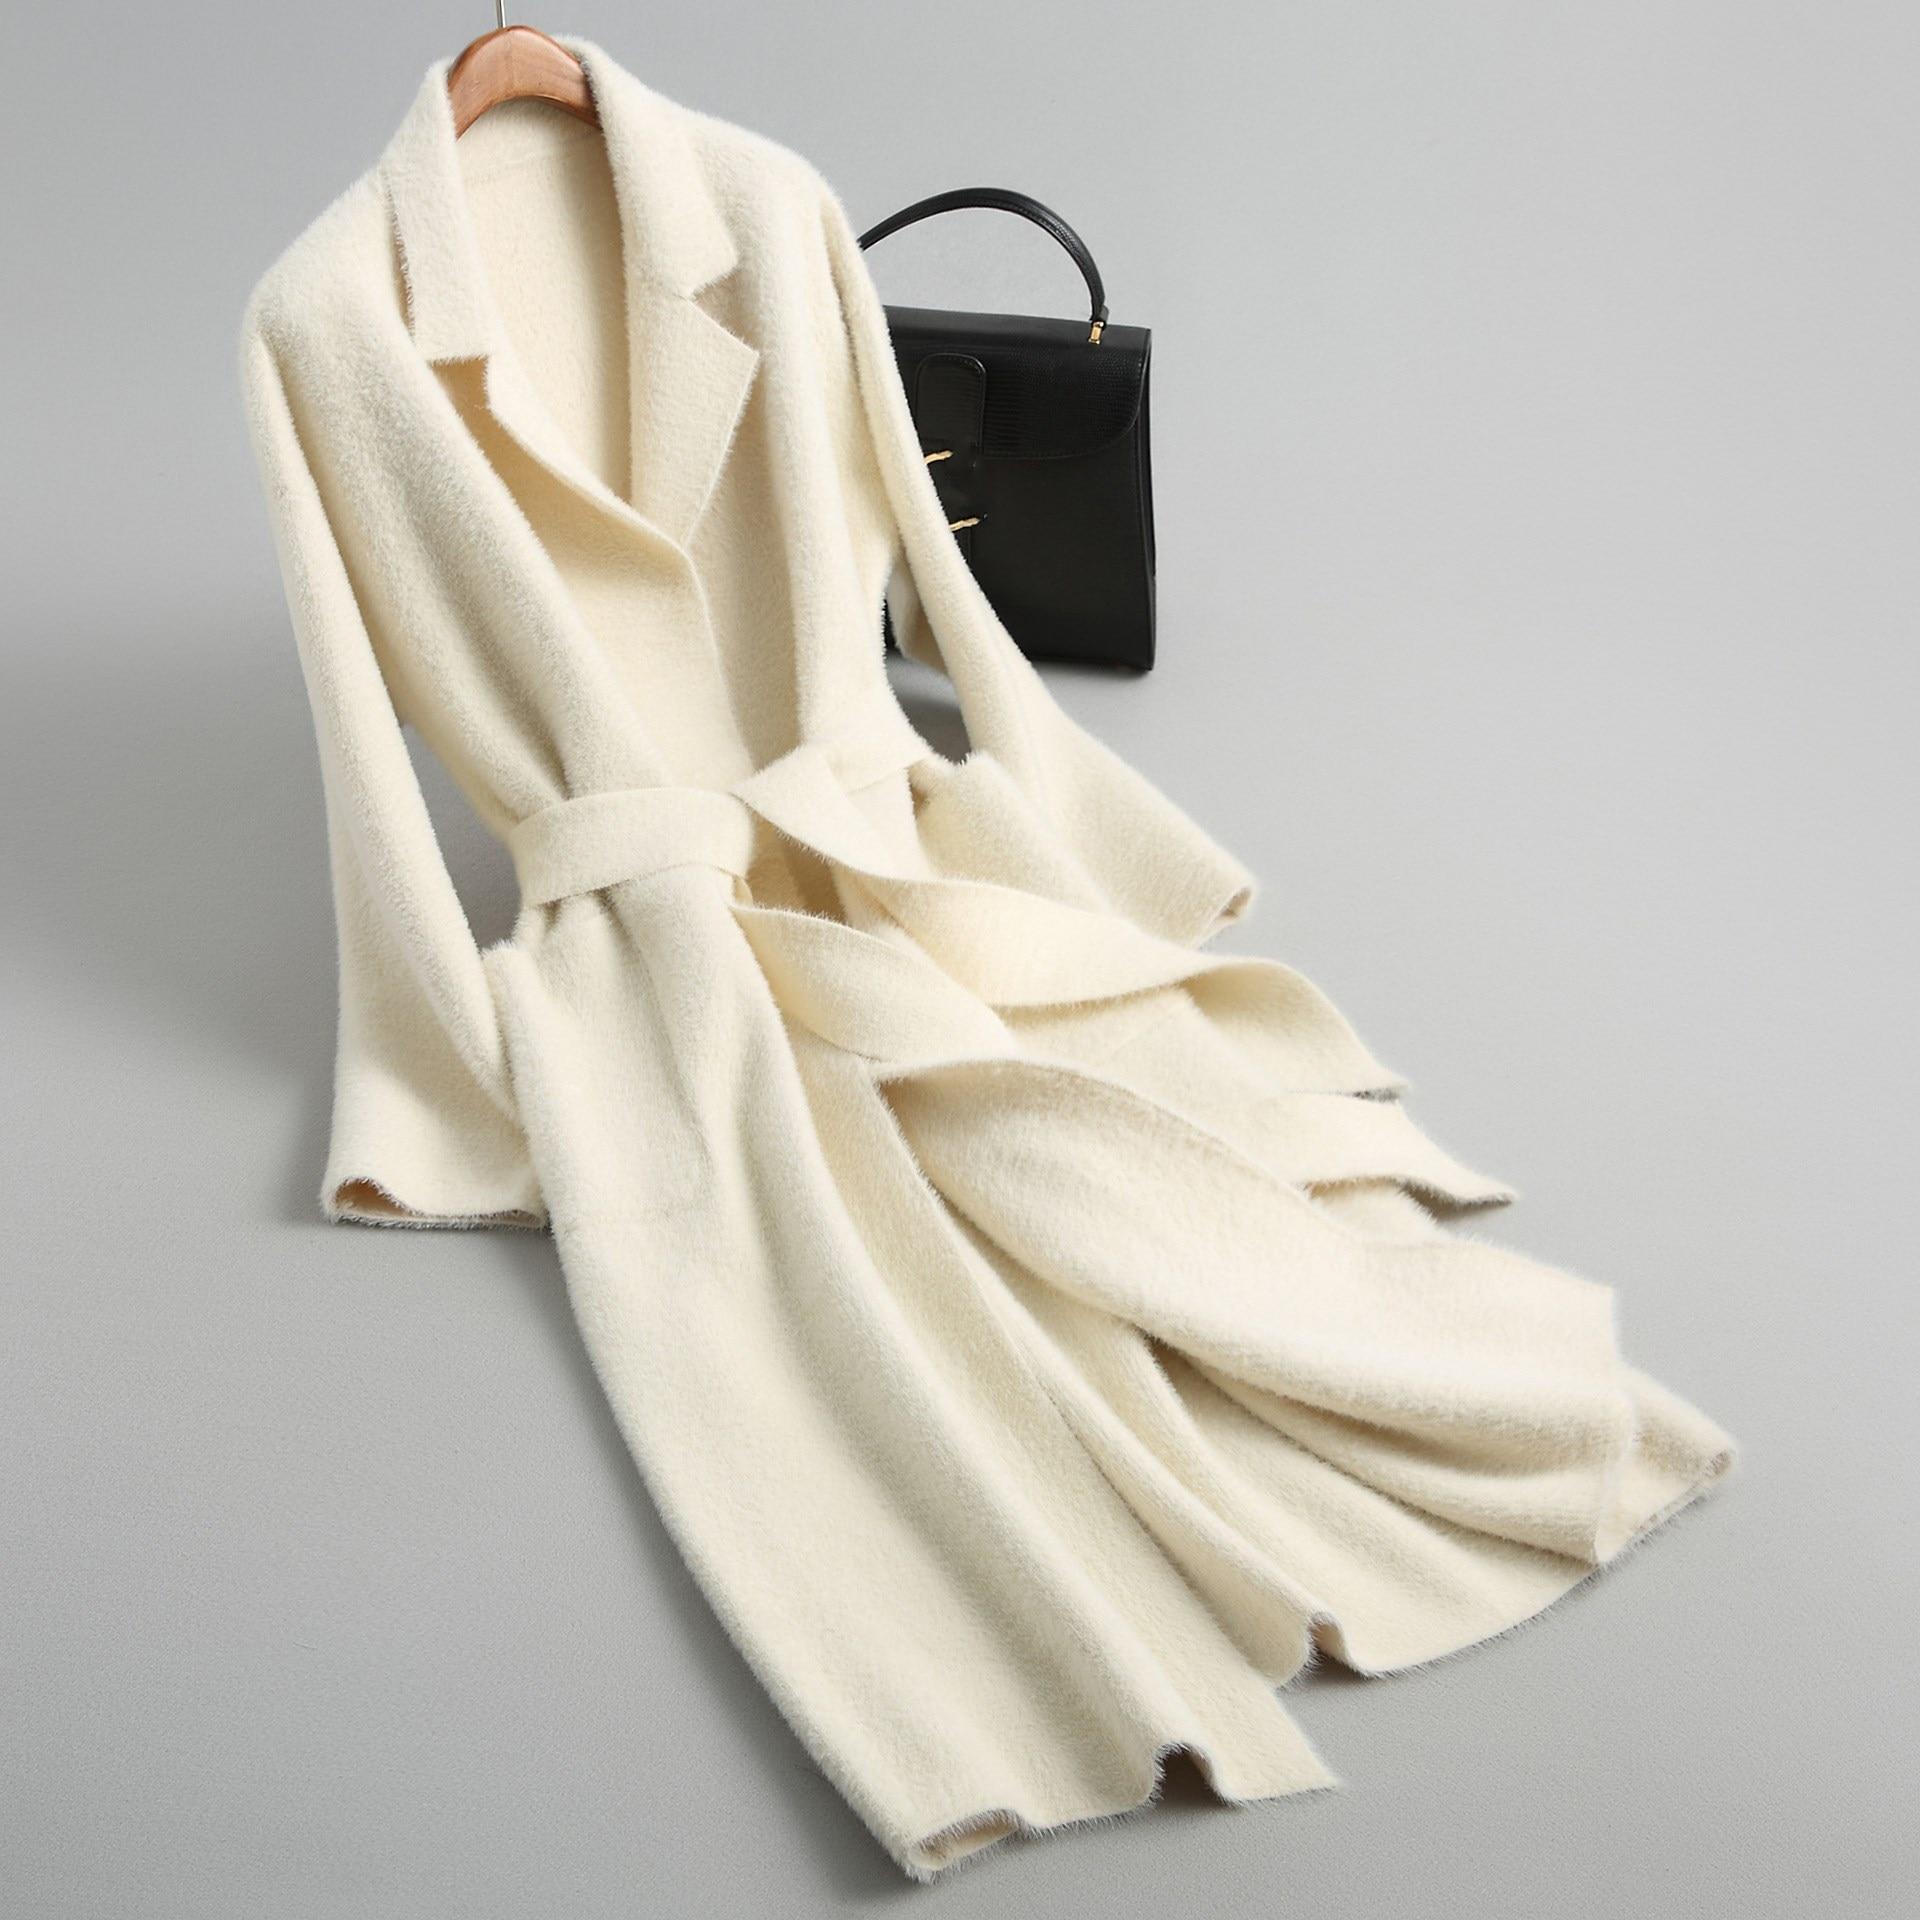 Winter Coats Female Solid Sashes Long Jacket Women Knitted Faux Woolen Coat Alpaca Cashmere Coat Female Long Coat Outwear